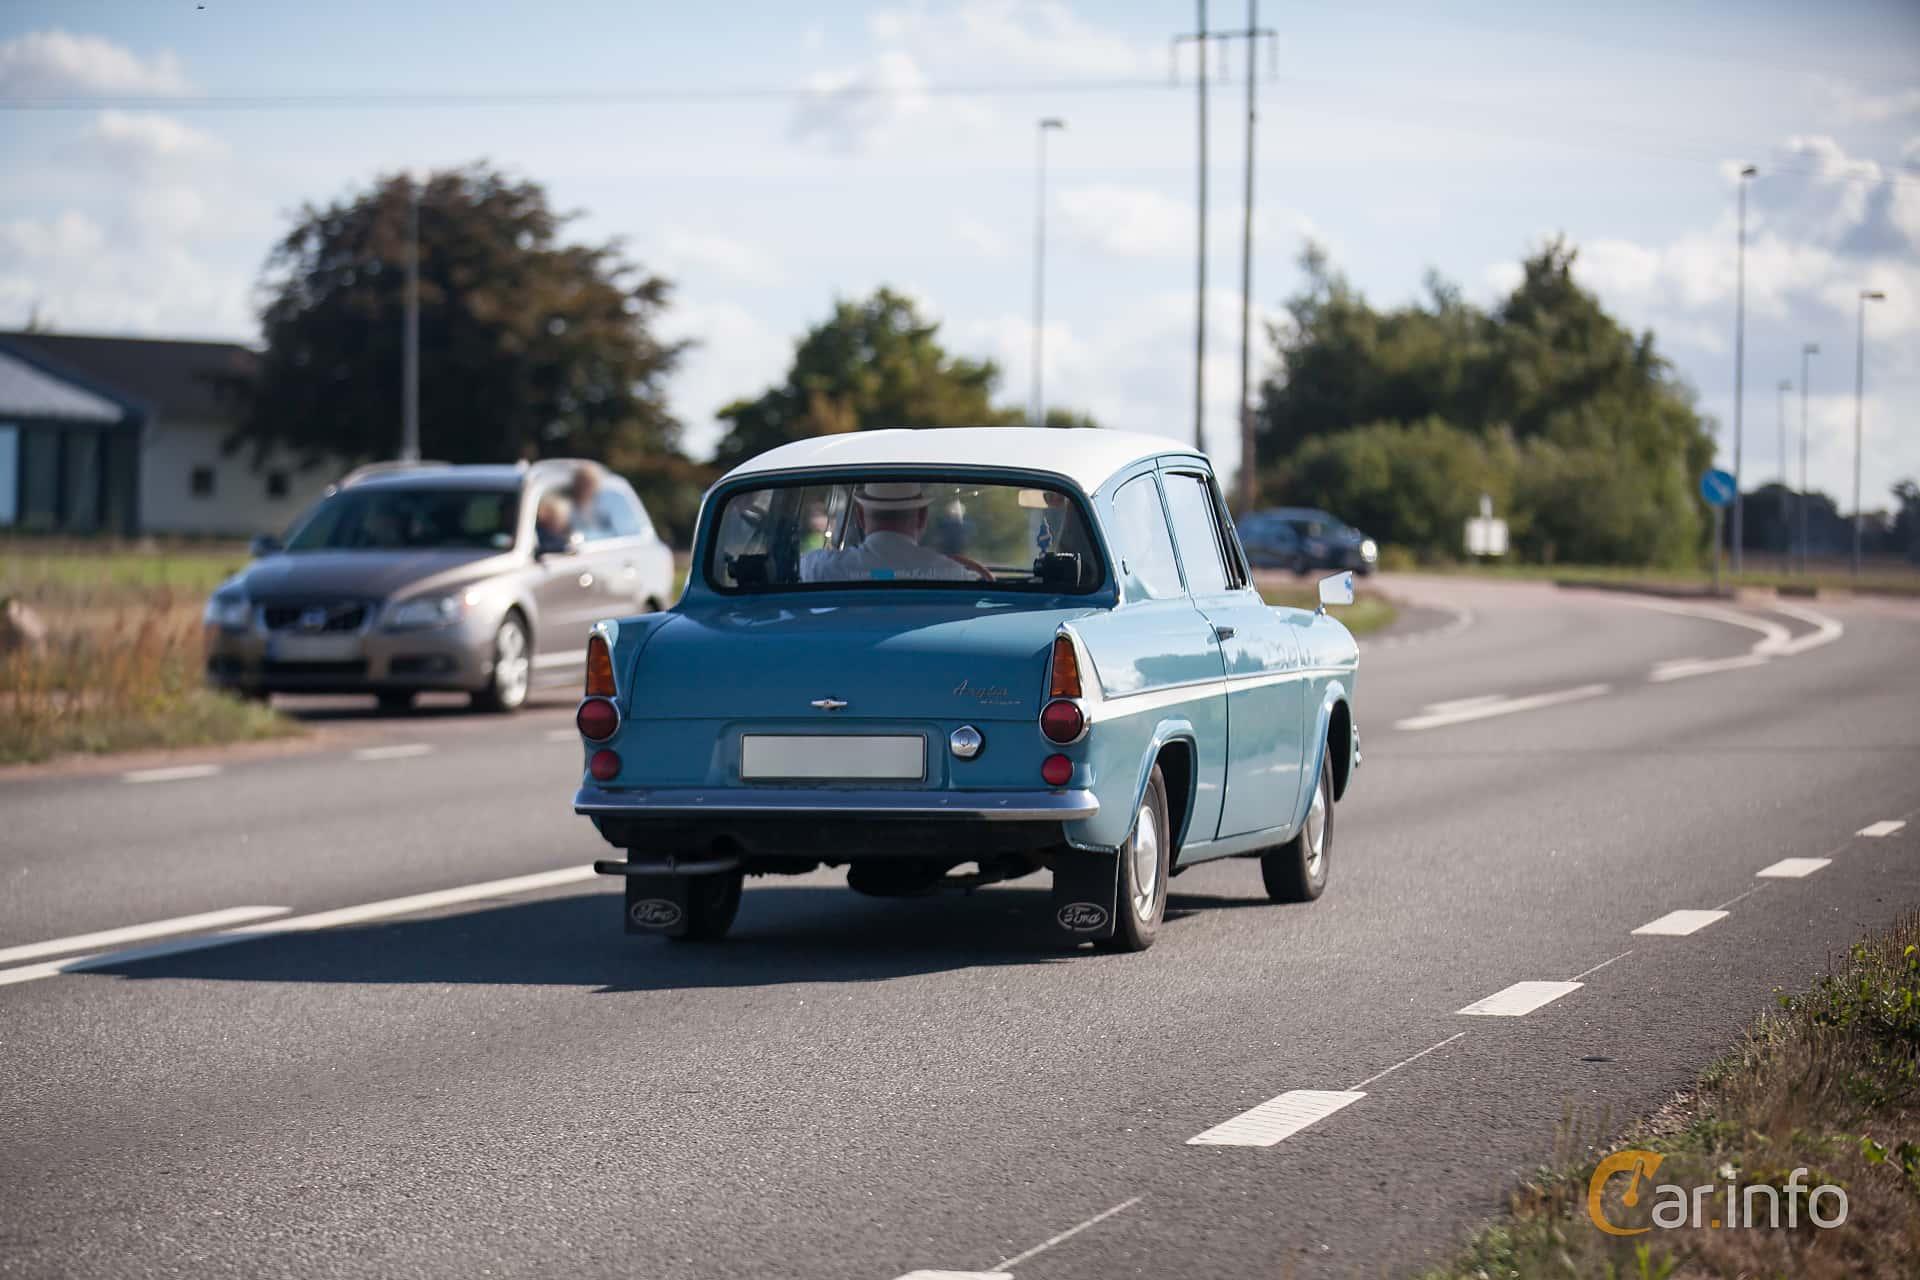 Ford Anglia 1.0 Manual, 39hp, 1961 at Lergökarallyt 2018